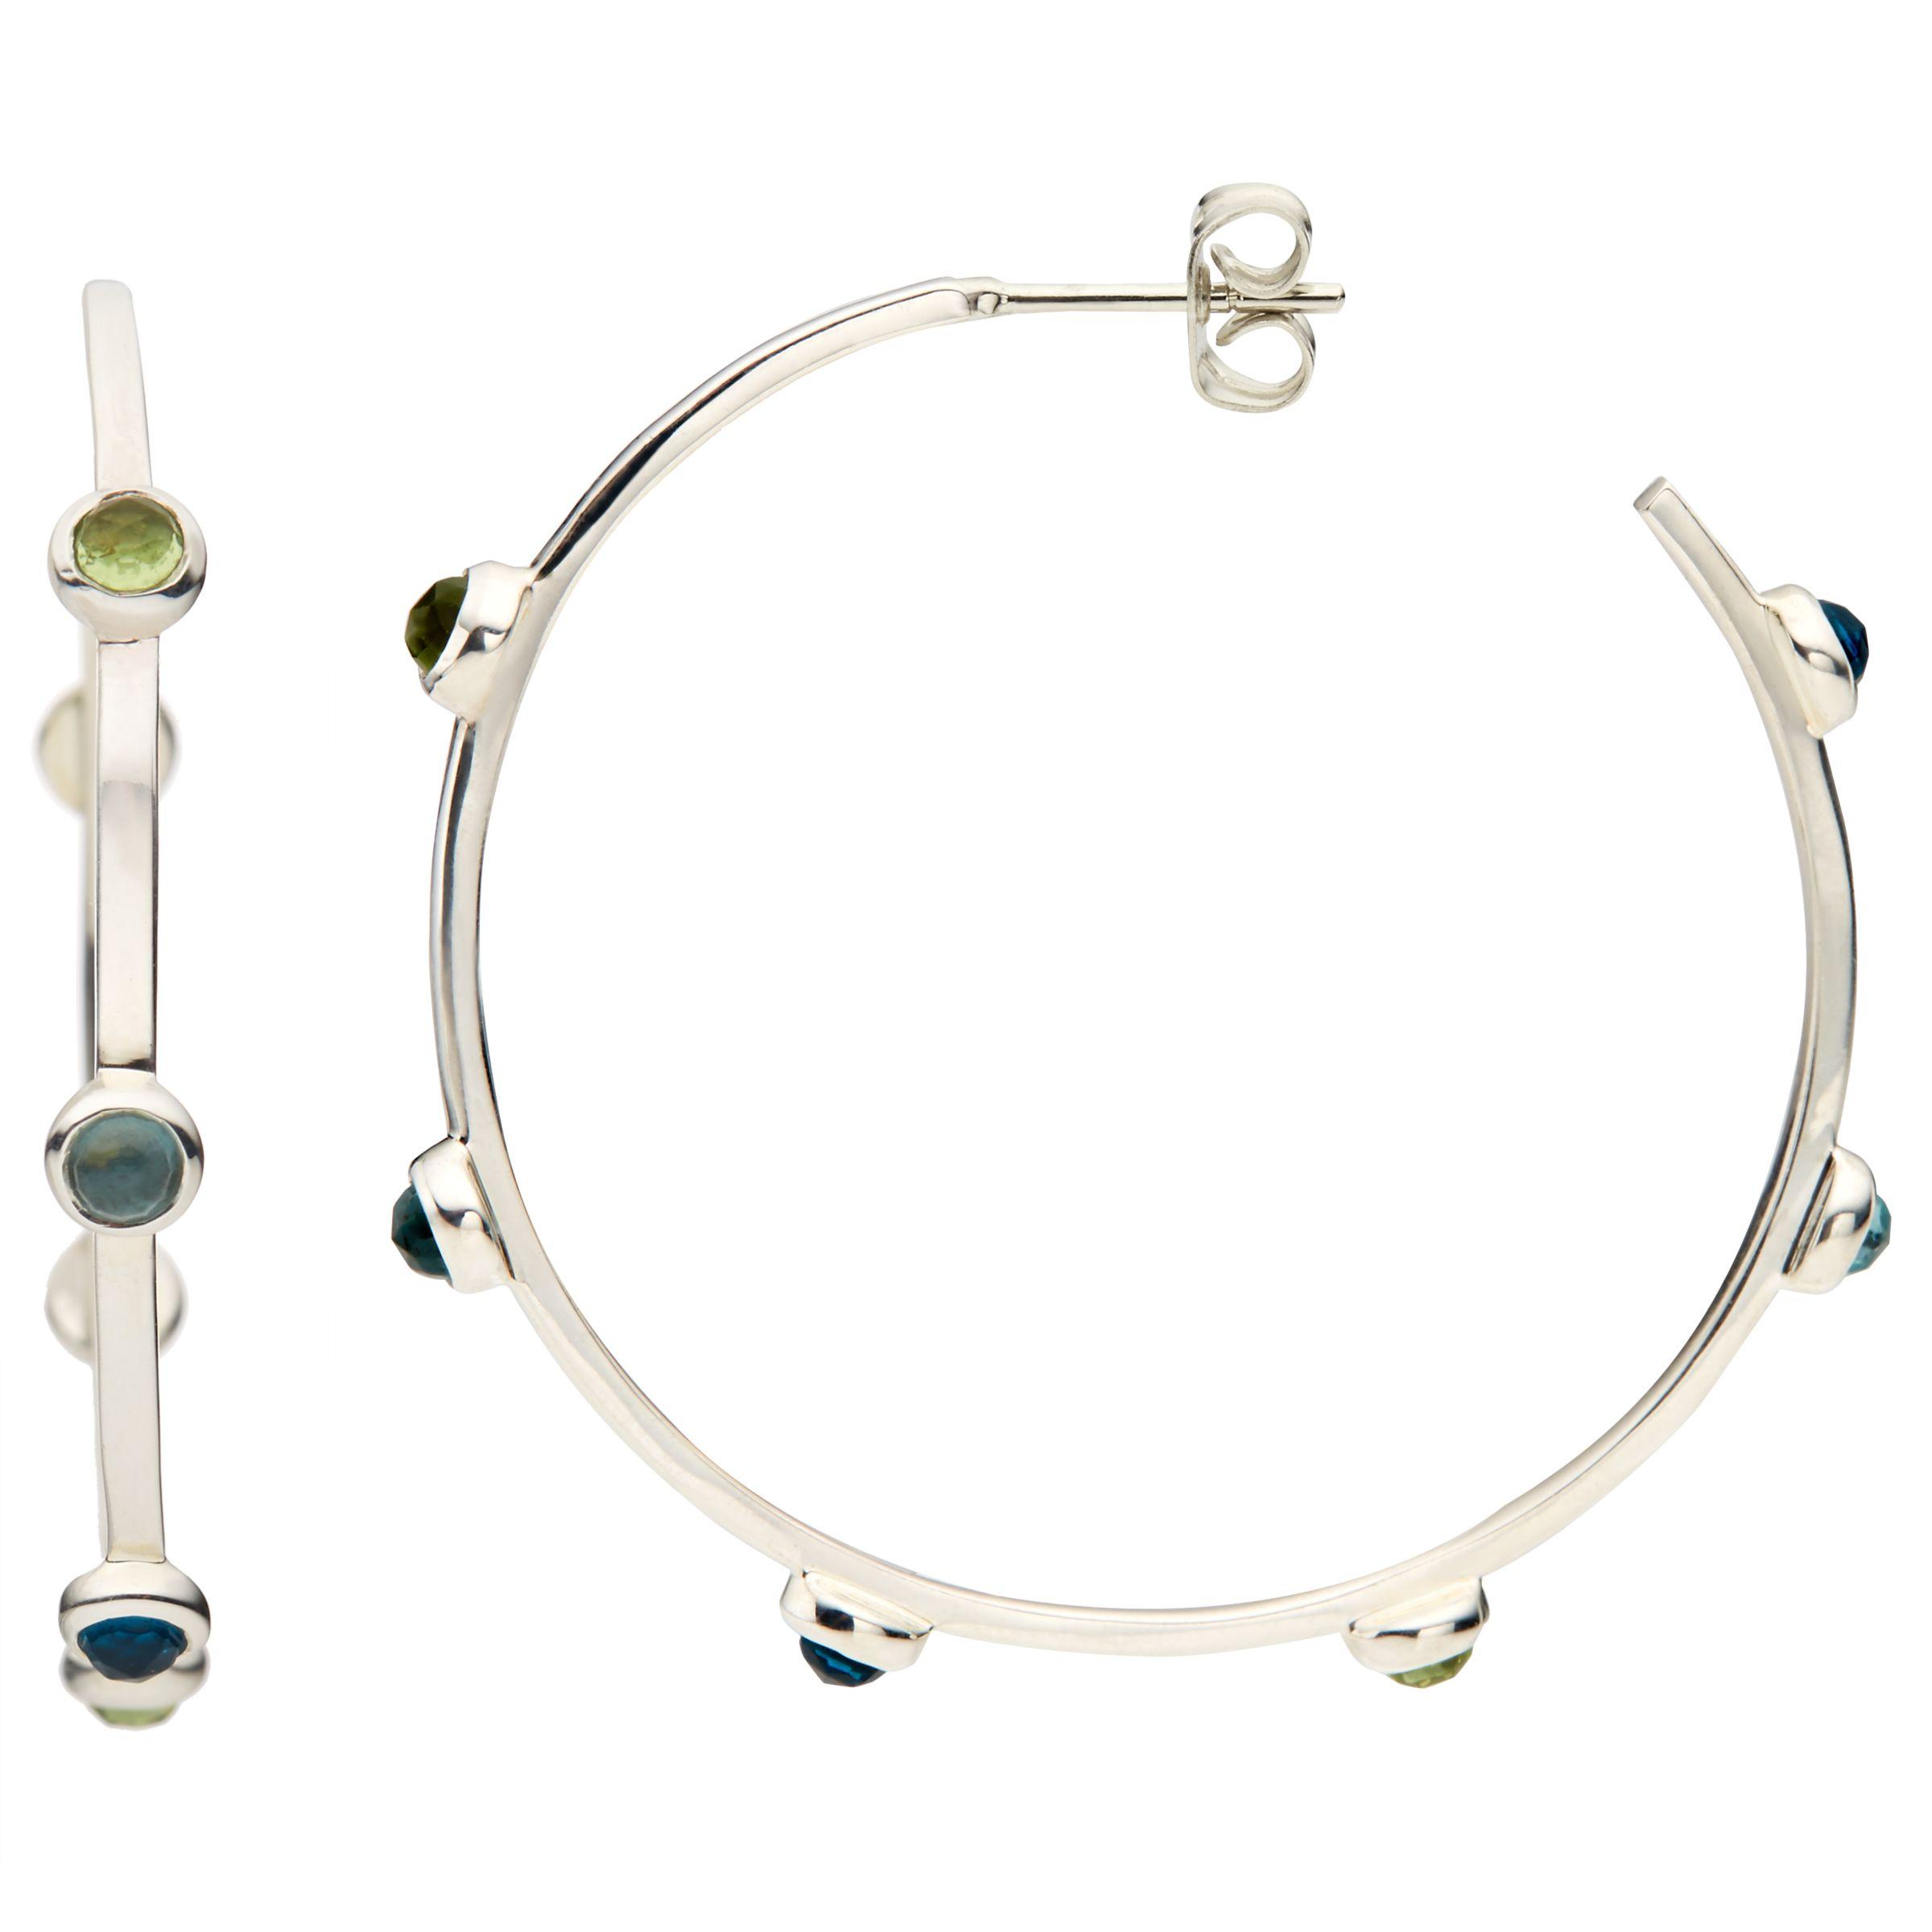 John Lewis Gemstones John Lewis Gemstones Large Multi Stone Hoop Earrings, Silver/Multi